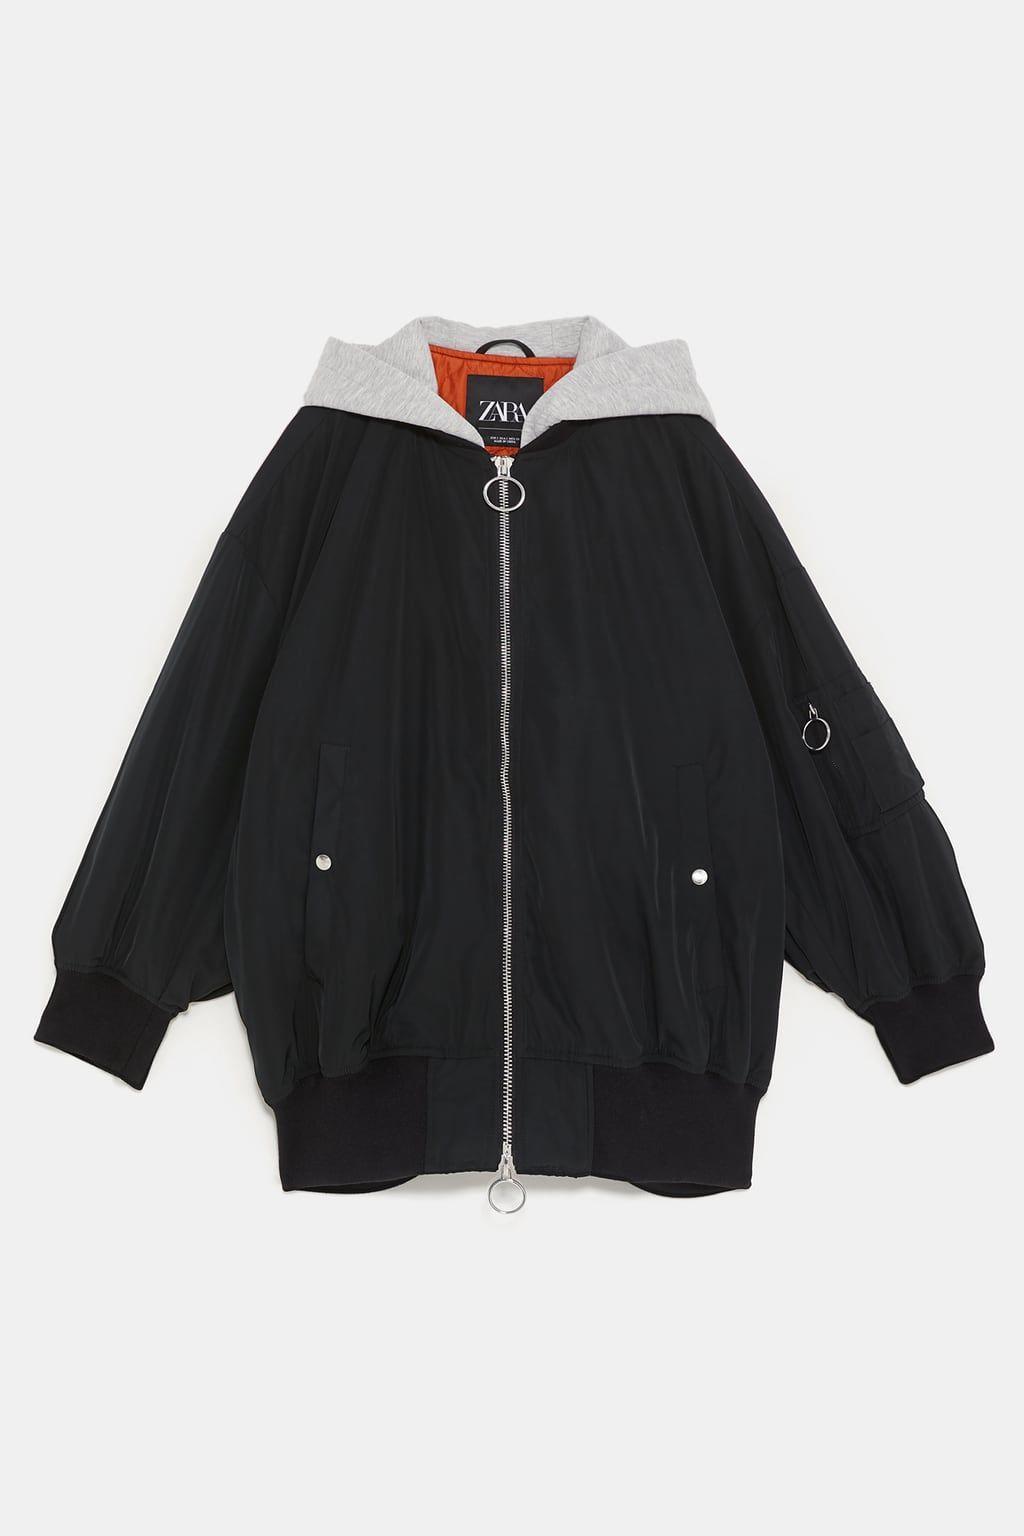 Image 9 Of Bomber Jacket With Contrast Hood From Zara Tuch Bekleidungsstile Bequeme Klamotten [ 1536 x 1024 Pixel ]